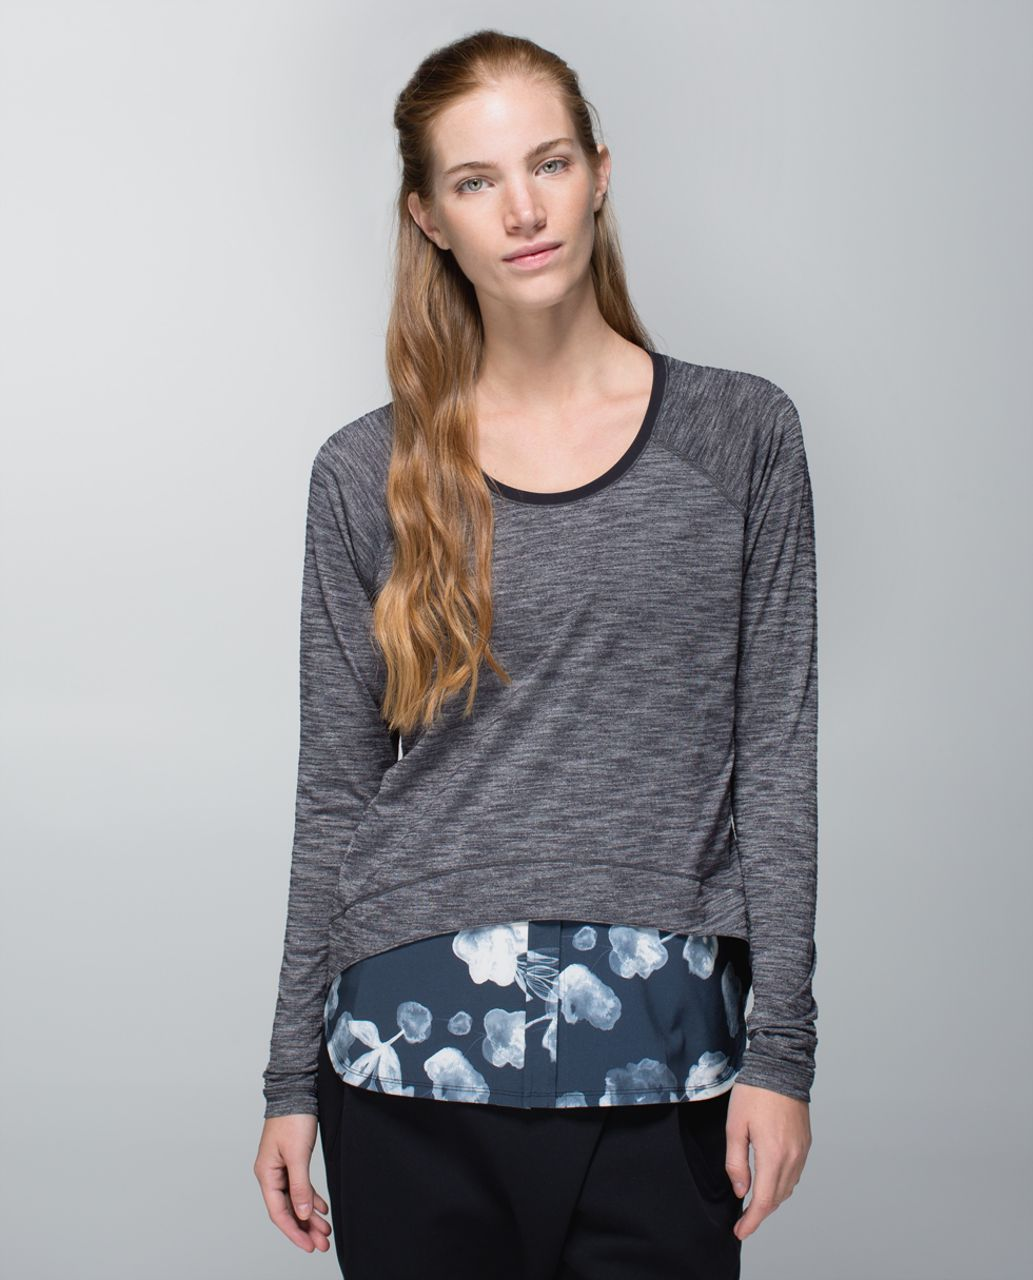 Lululemon Layered Long Sleeve Tee - Heathered Black / Inky Floral Black Ghost / Black